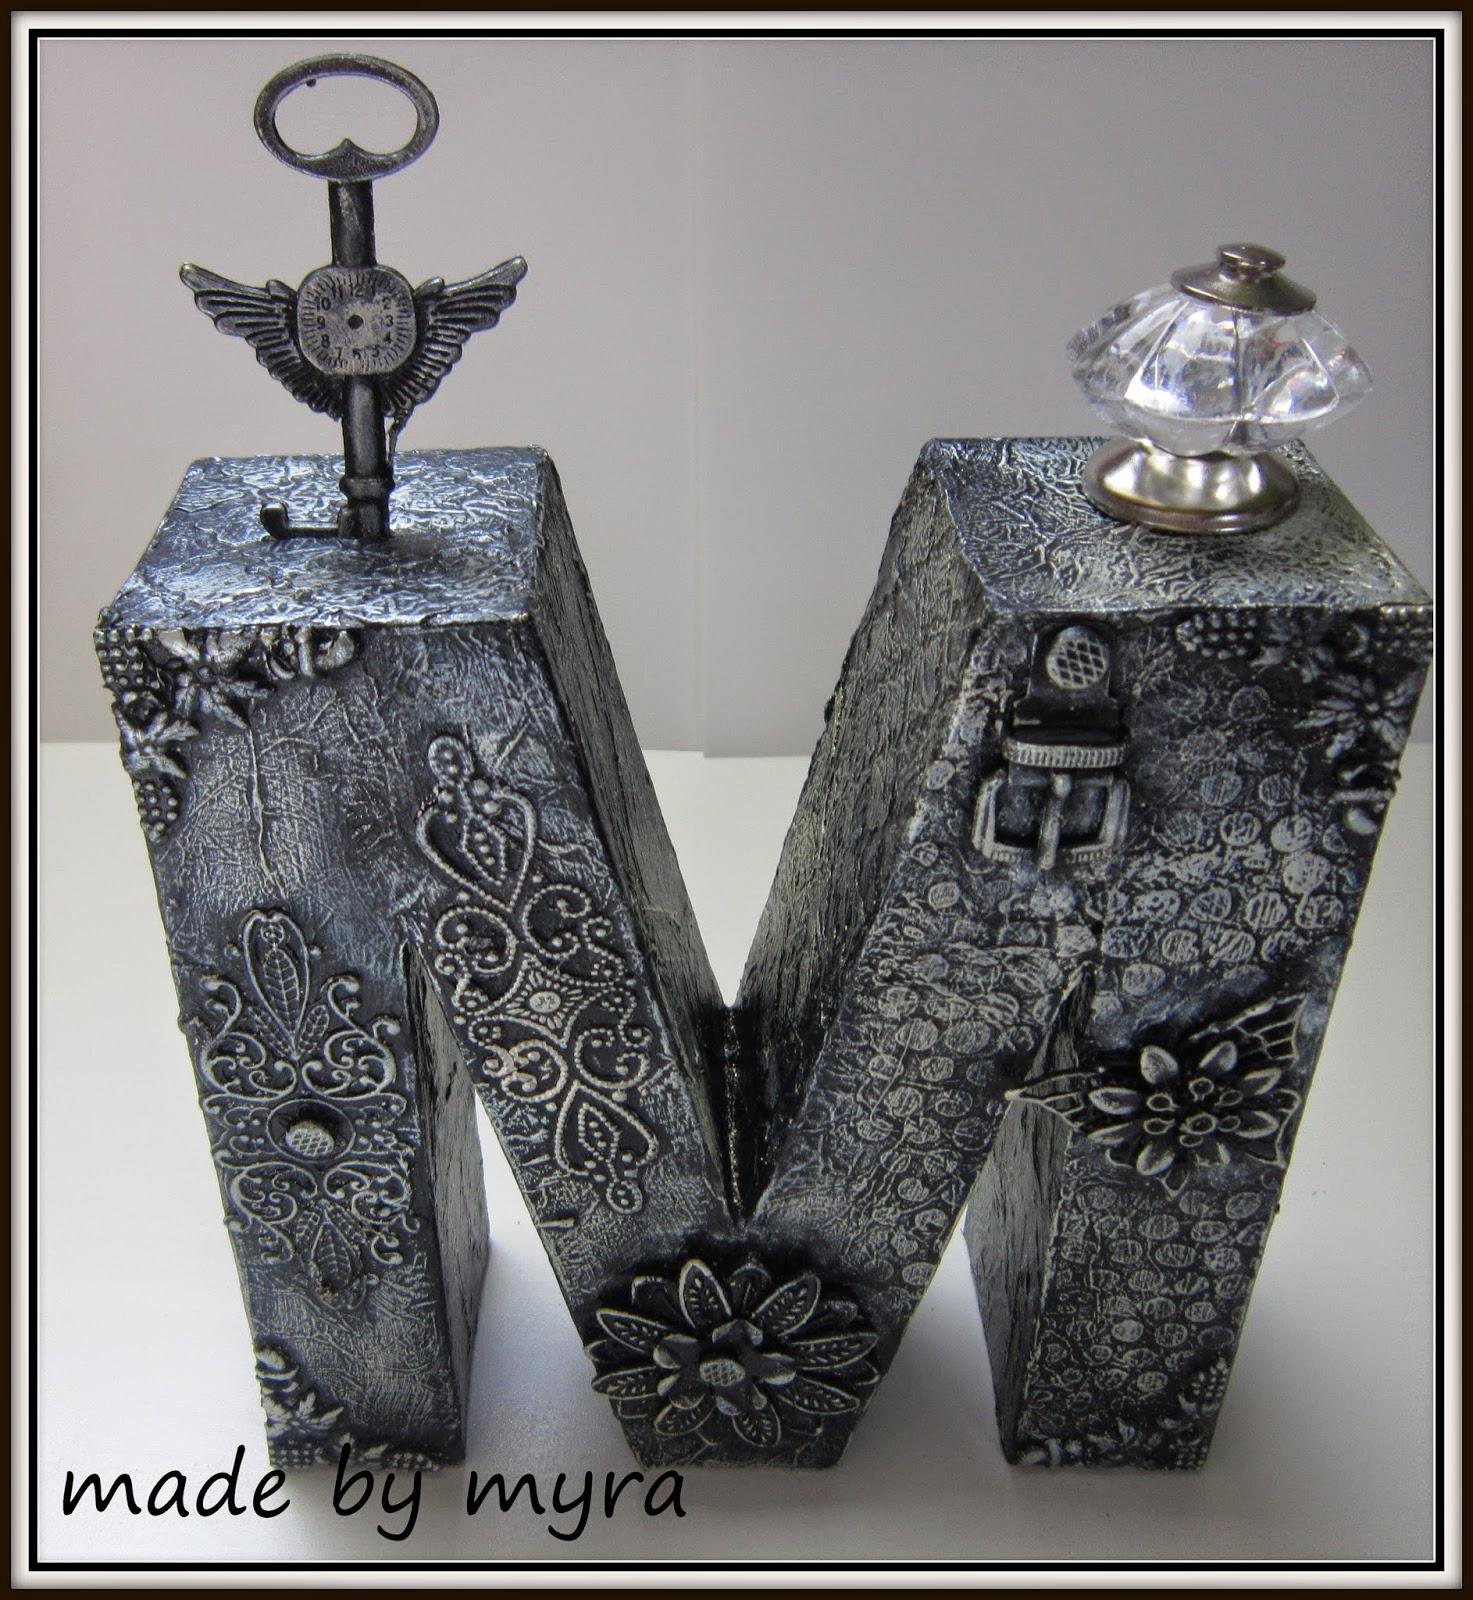 http://madebymyra.blogspot.nl/2014/05/mb.html